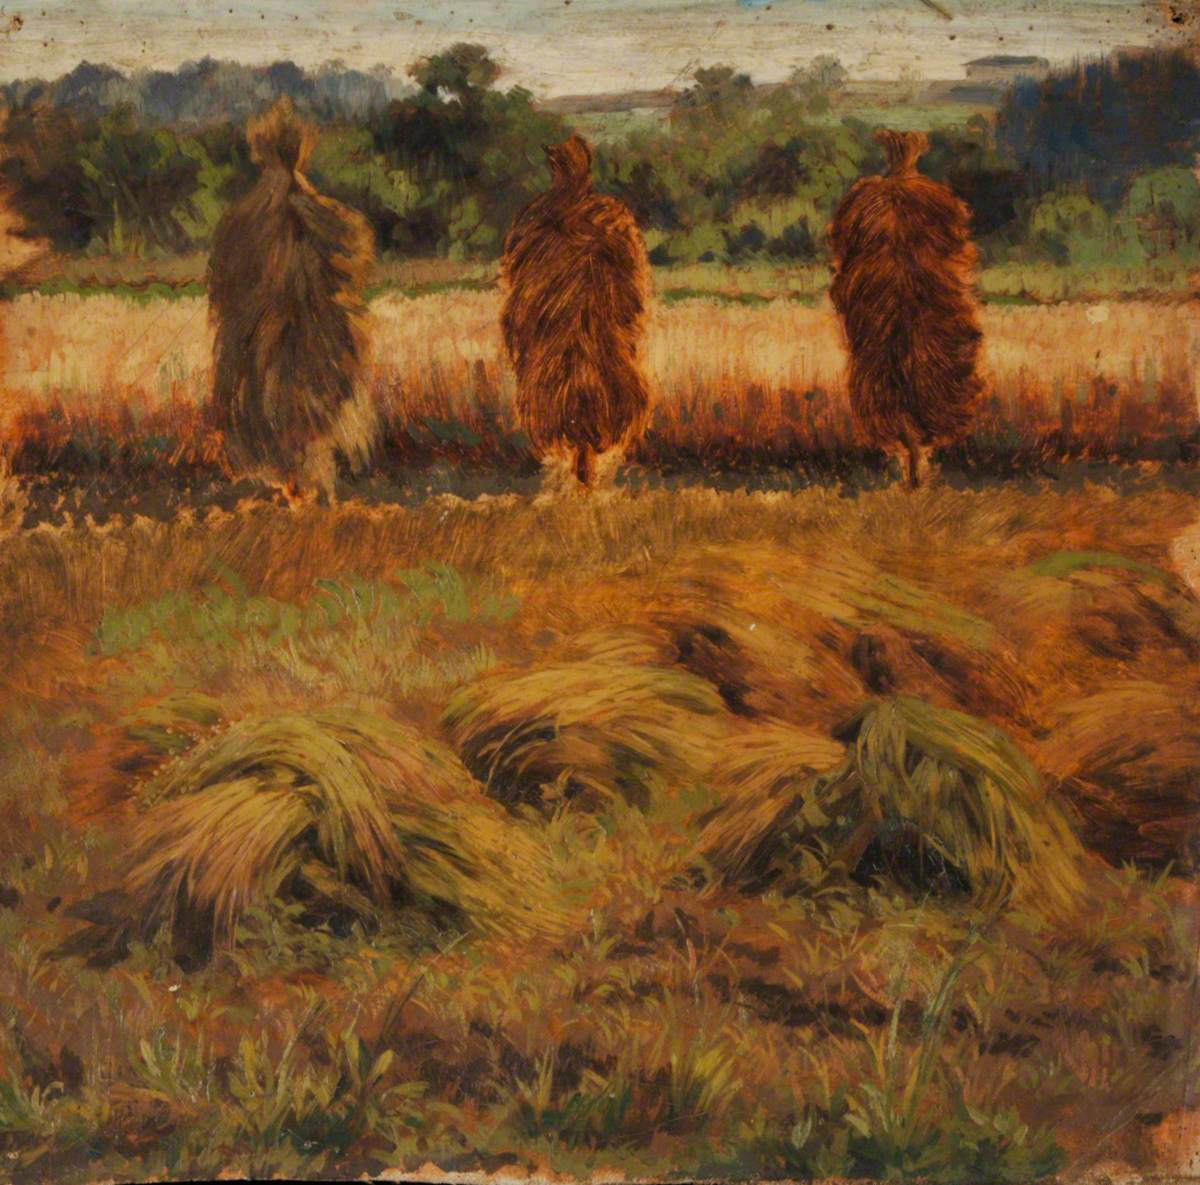 Hay Stooks in a Meadow